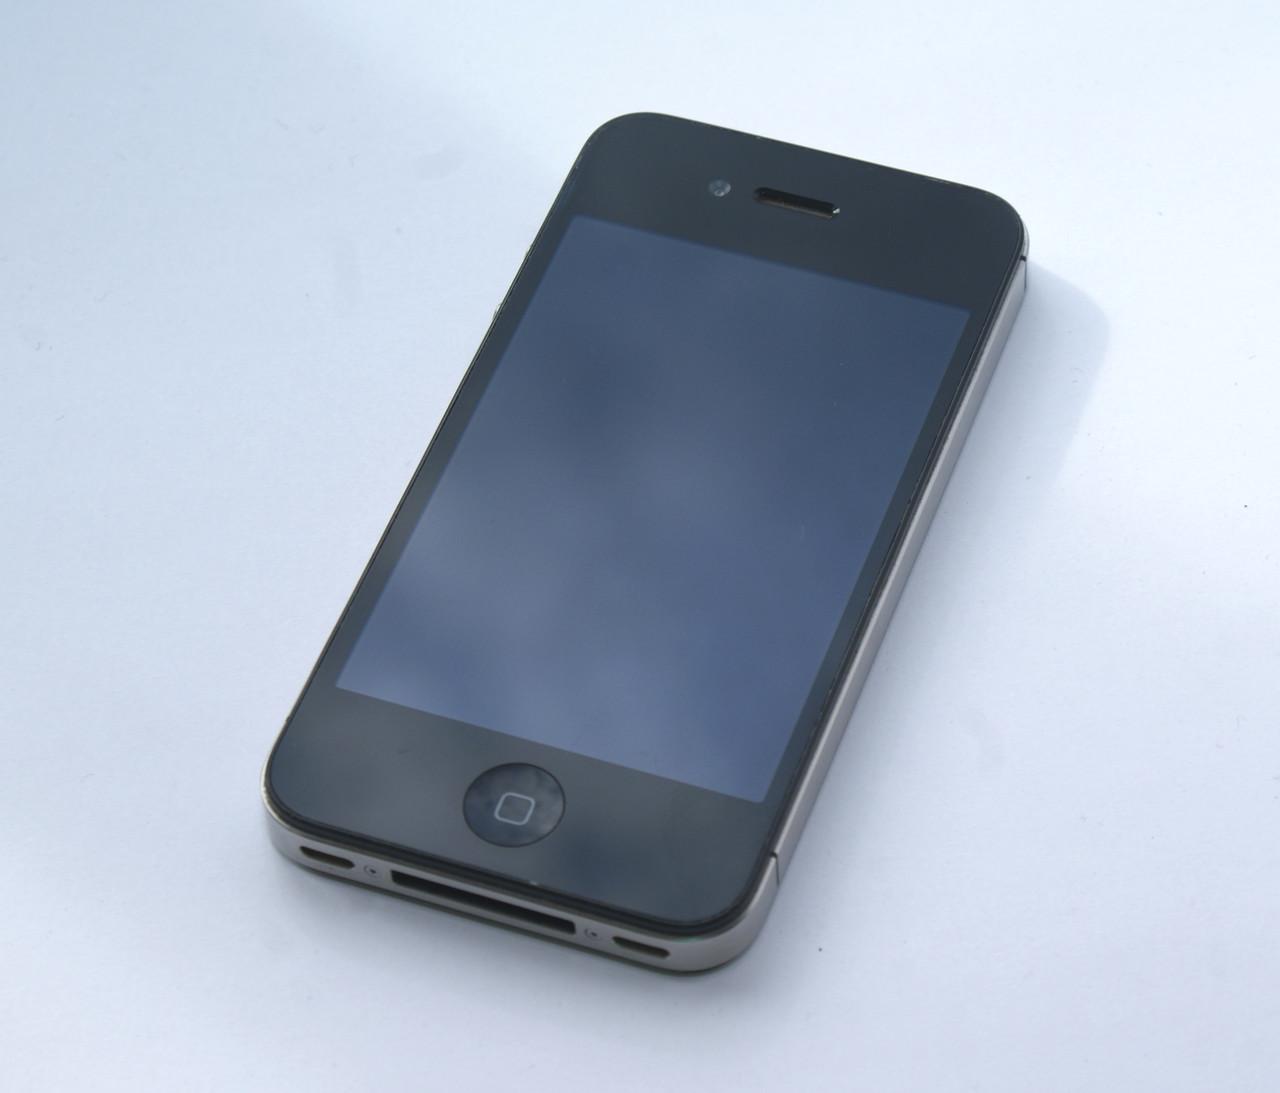 Apple iPhone 4 8GB CDMA A1349